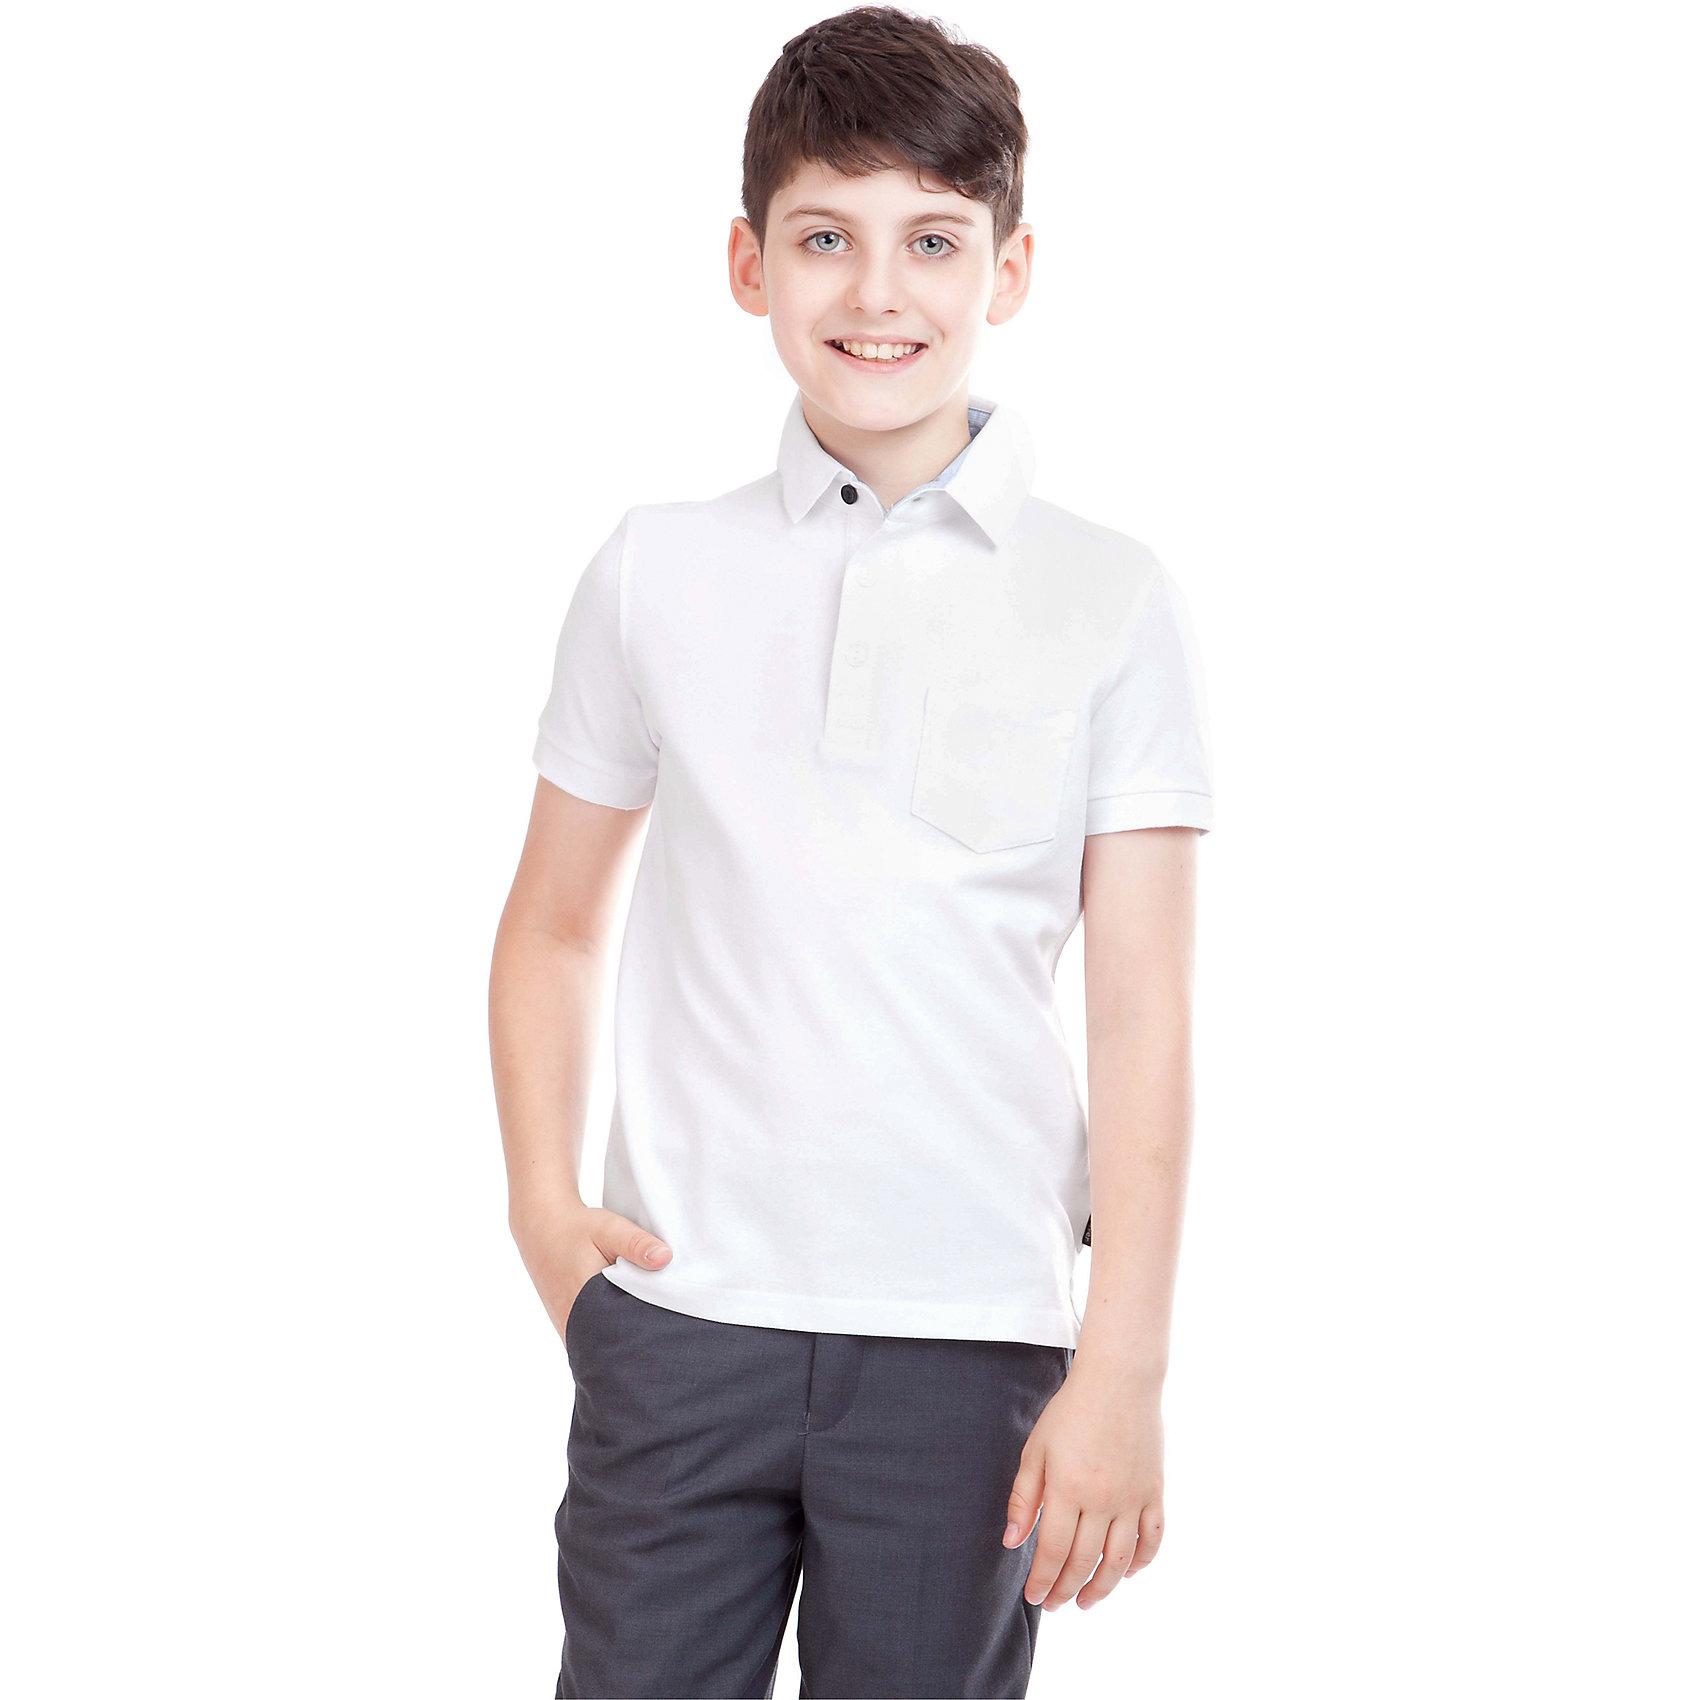 Gulliver Футболка-поло для мальчика Gulliver брюки для мальчика gulliver цвет черный 21612btc5601 размер 158